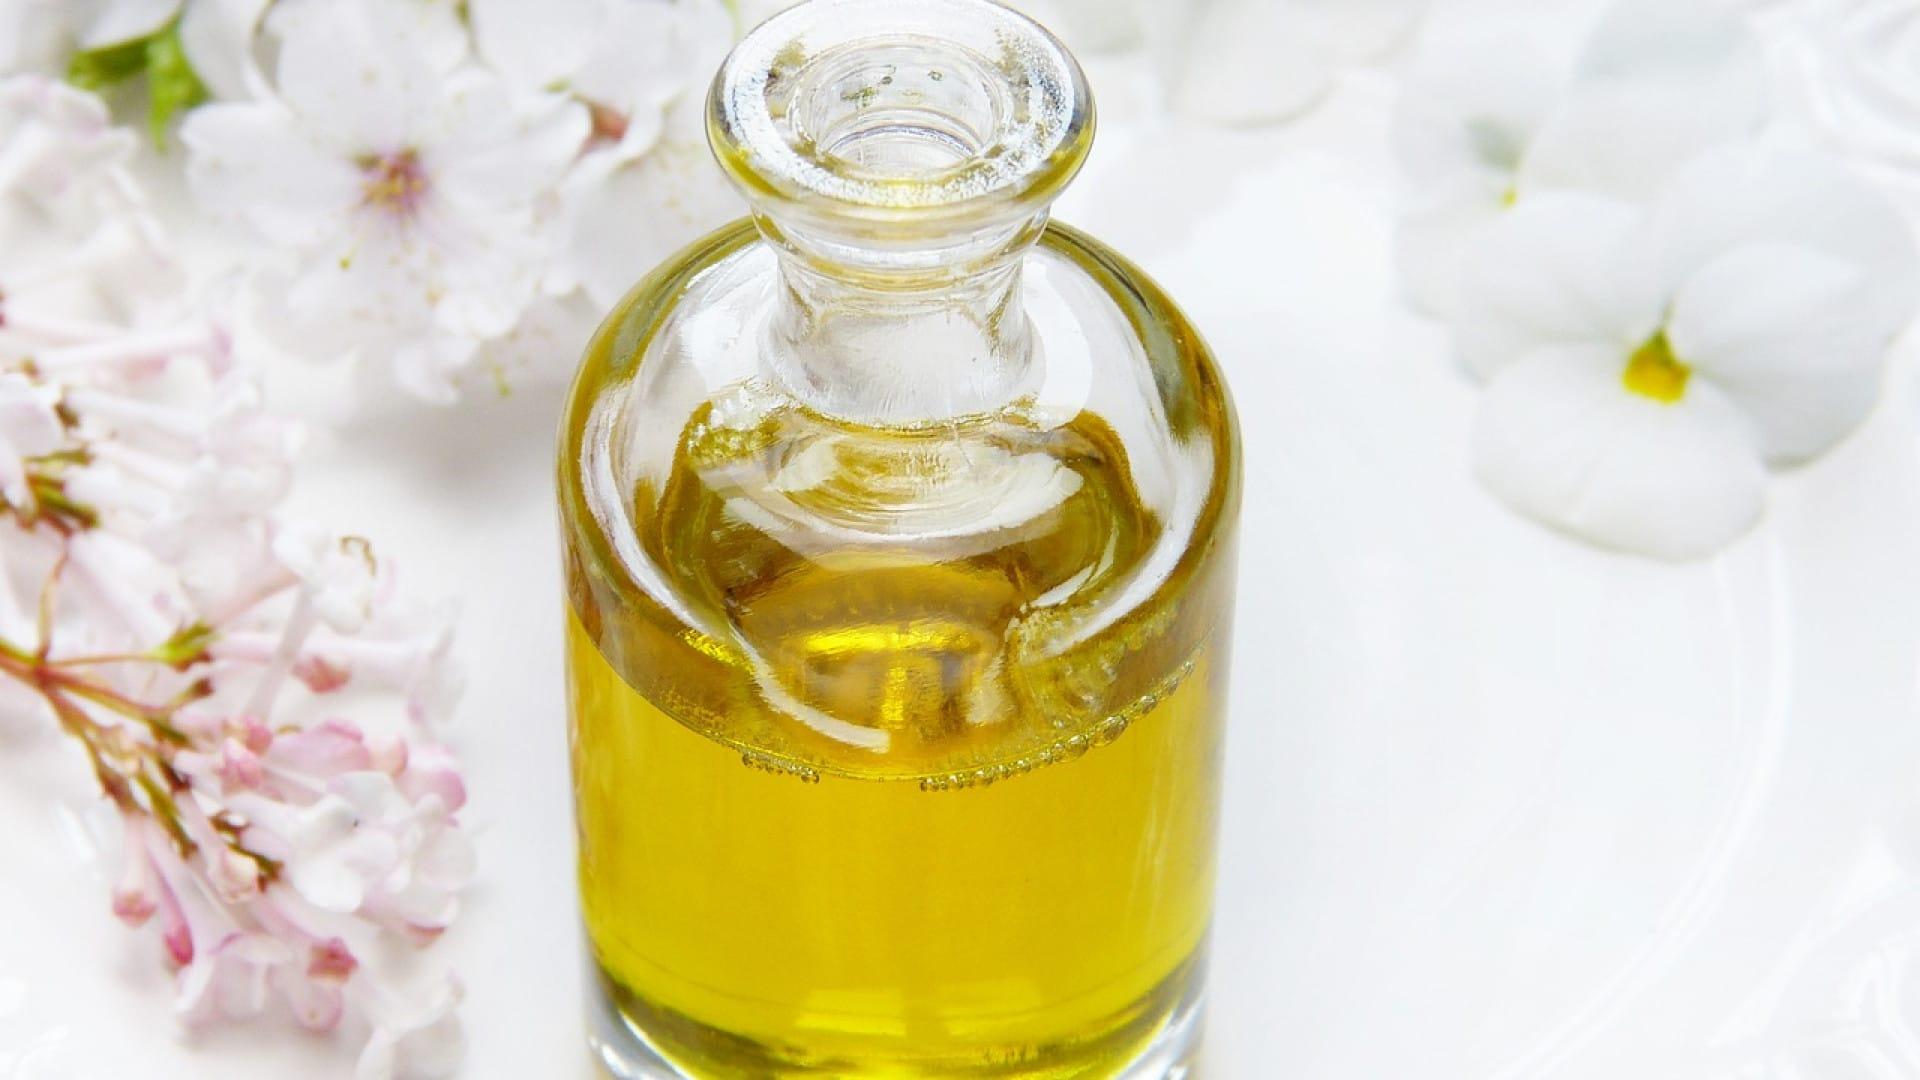 Une huile essentielle peut calmer l'eczéma